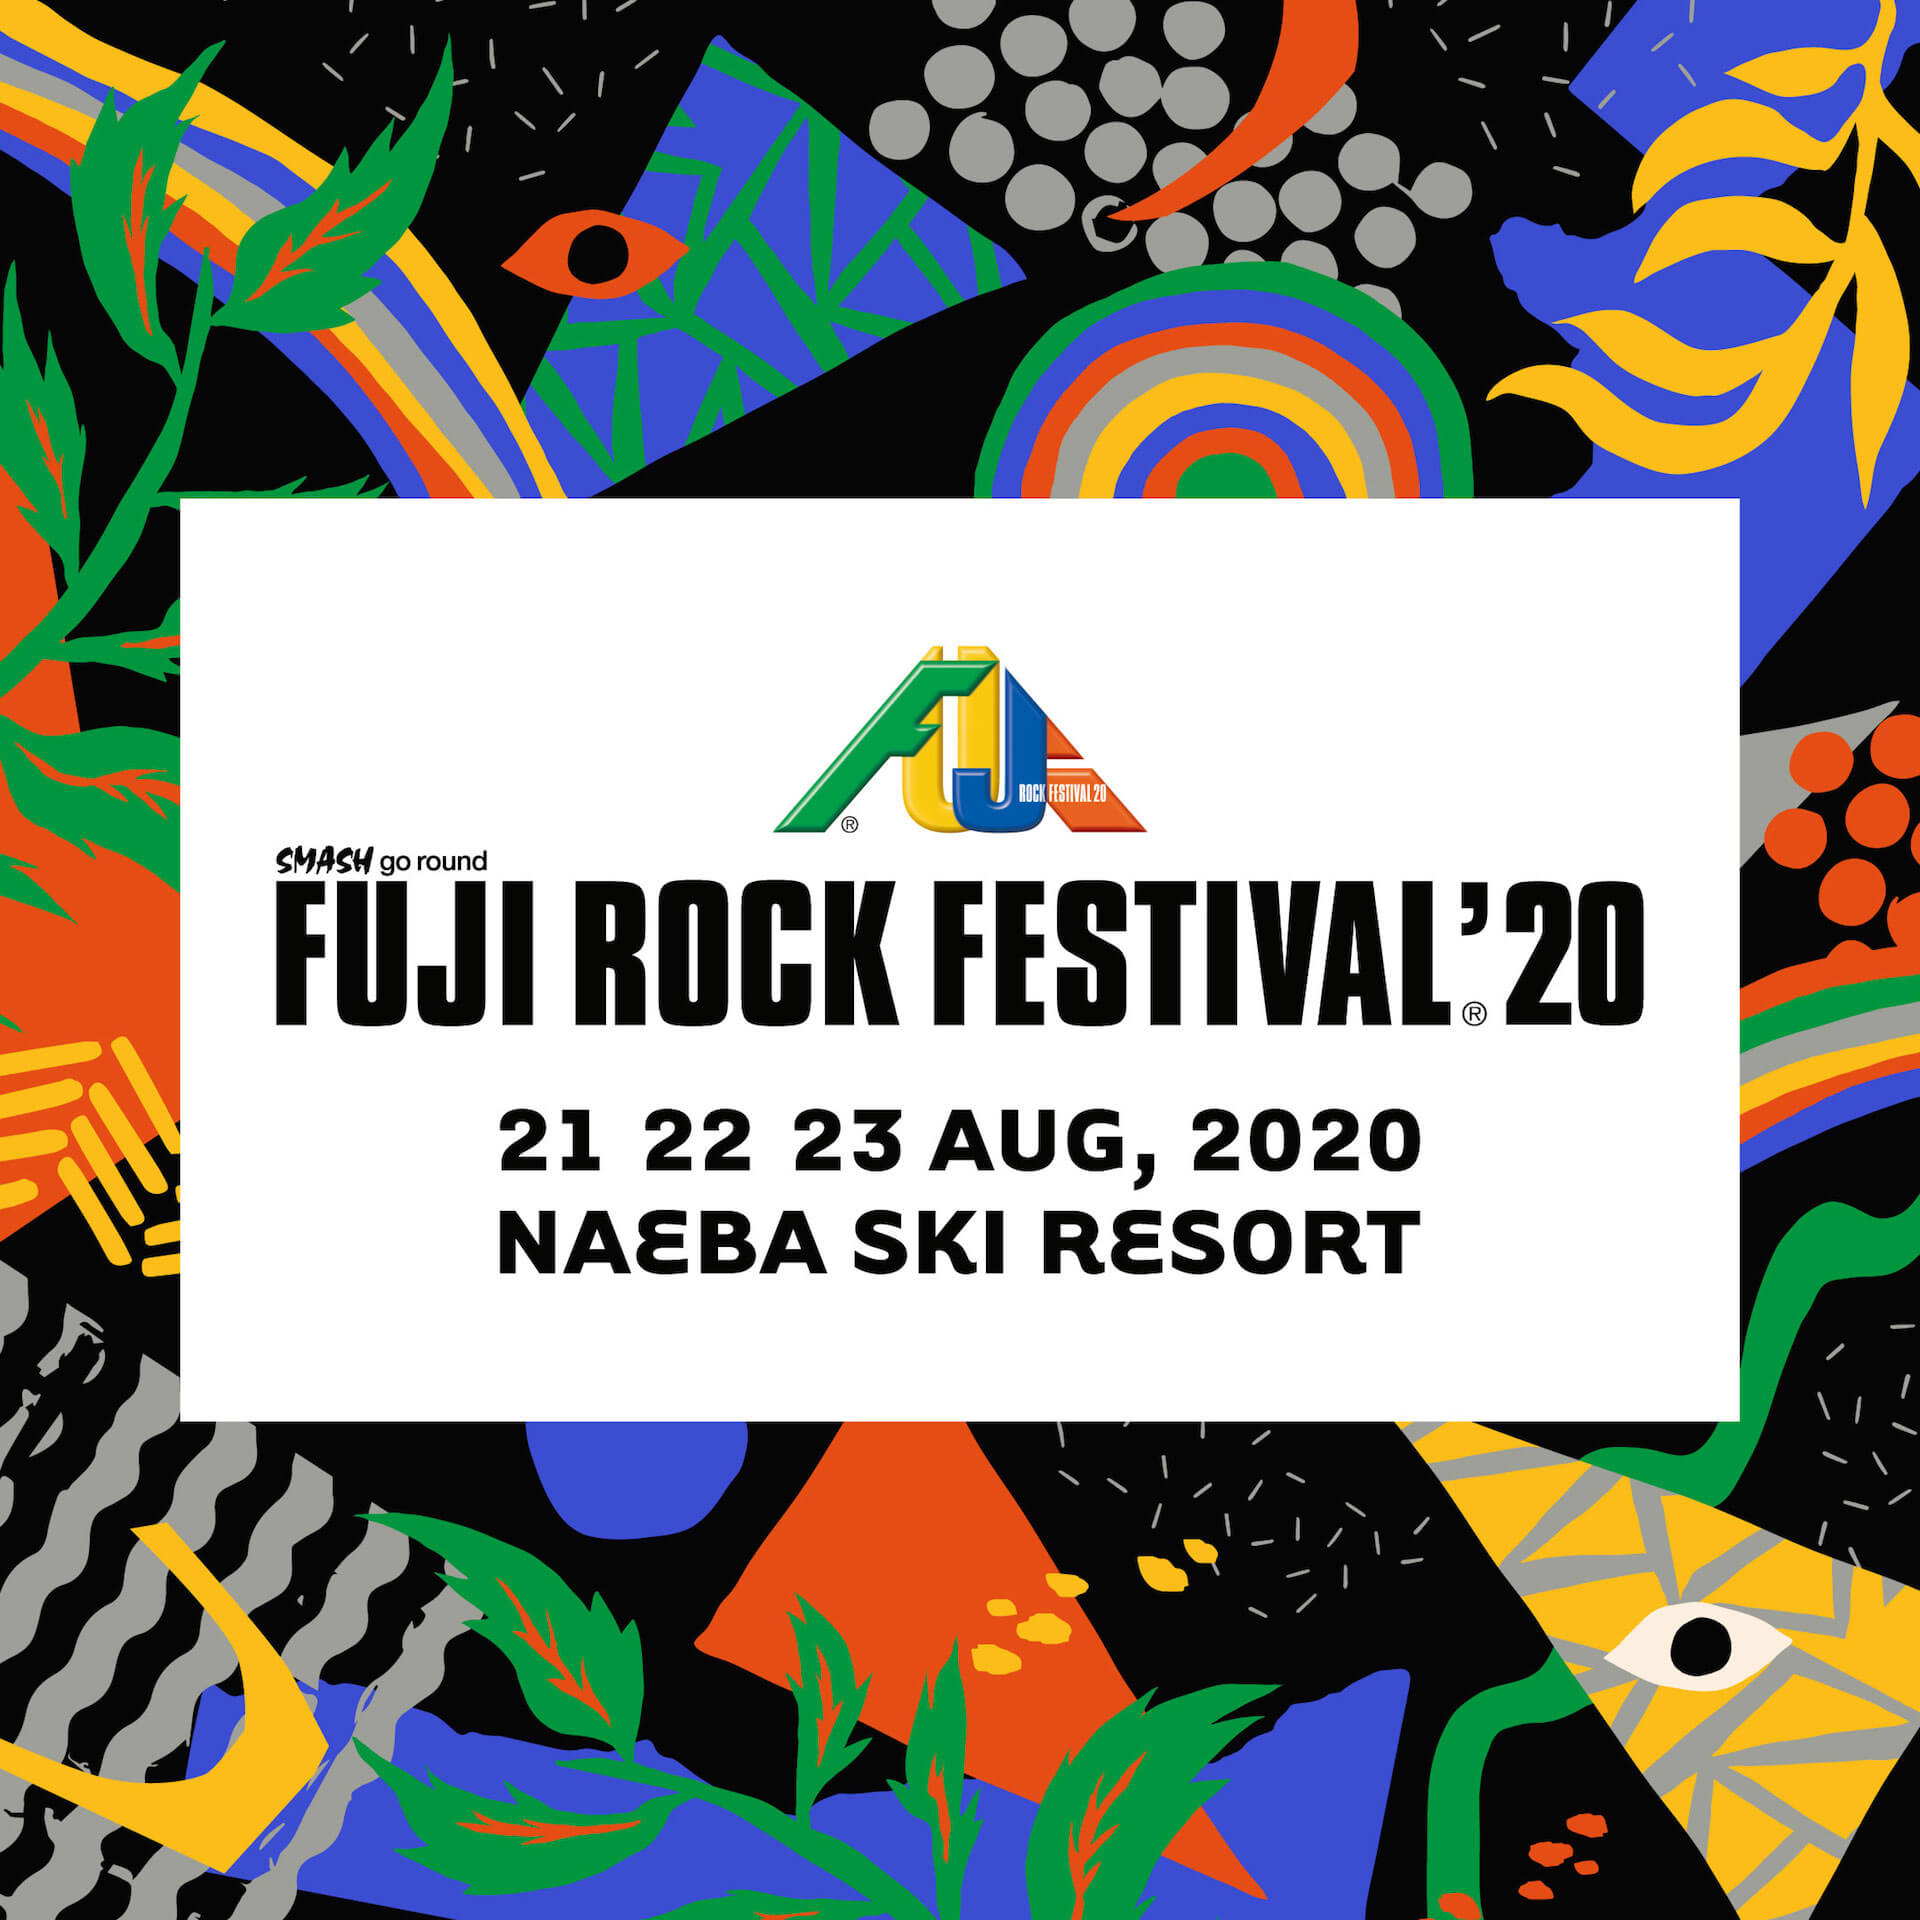 <FUJI ROCK FESTIVAL '20>の早割チケット受付開始日が2月10日に決定!ボードウォーク一部架け直しのためのクラウドファンディングも実施 music200131_frf2020_1